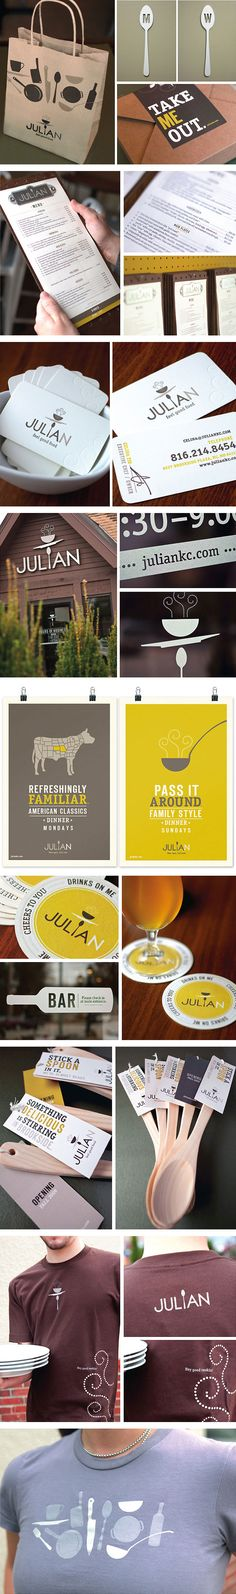 Julian #Restaurant Branding   good adaptation for collateral s